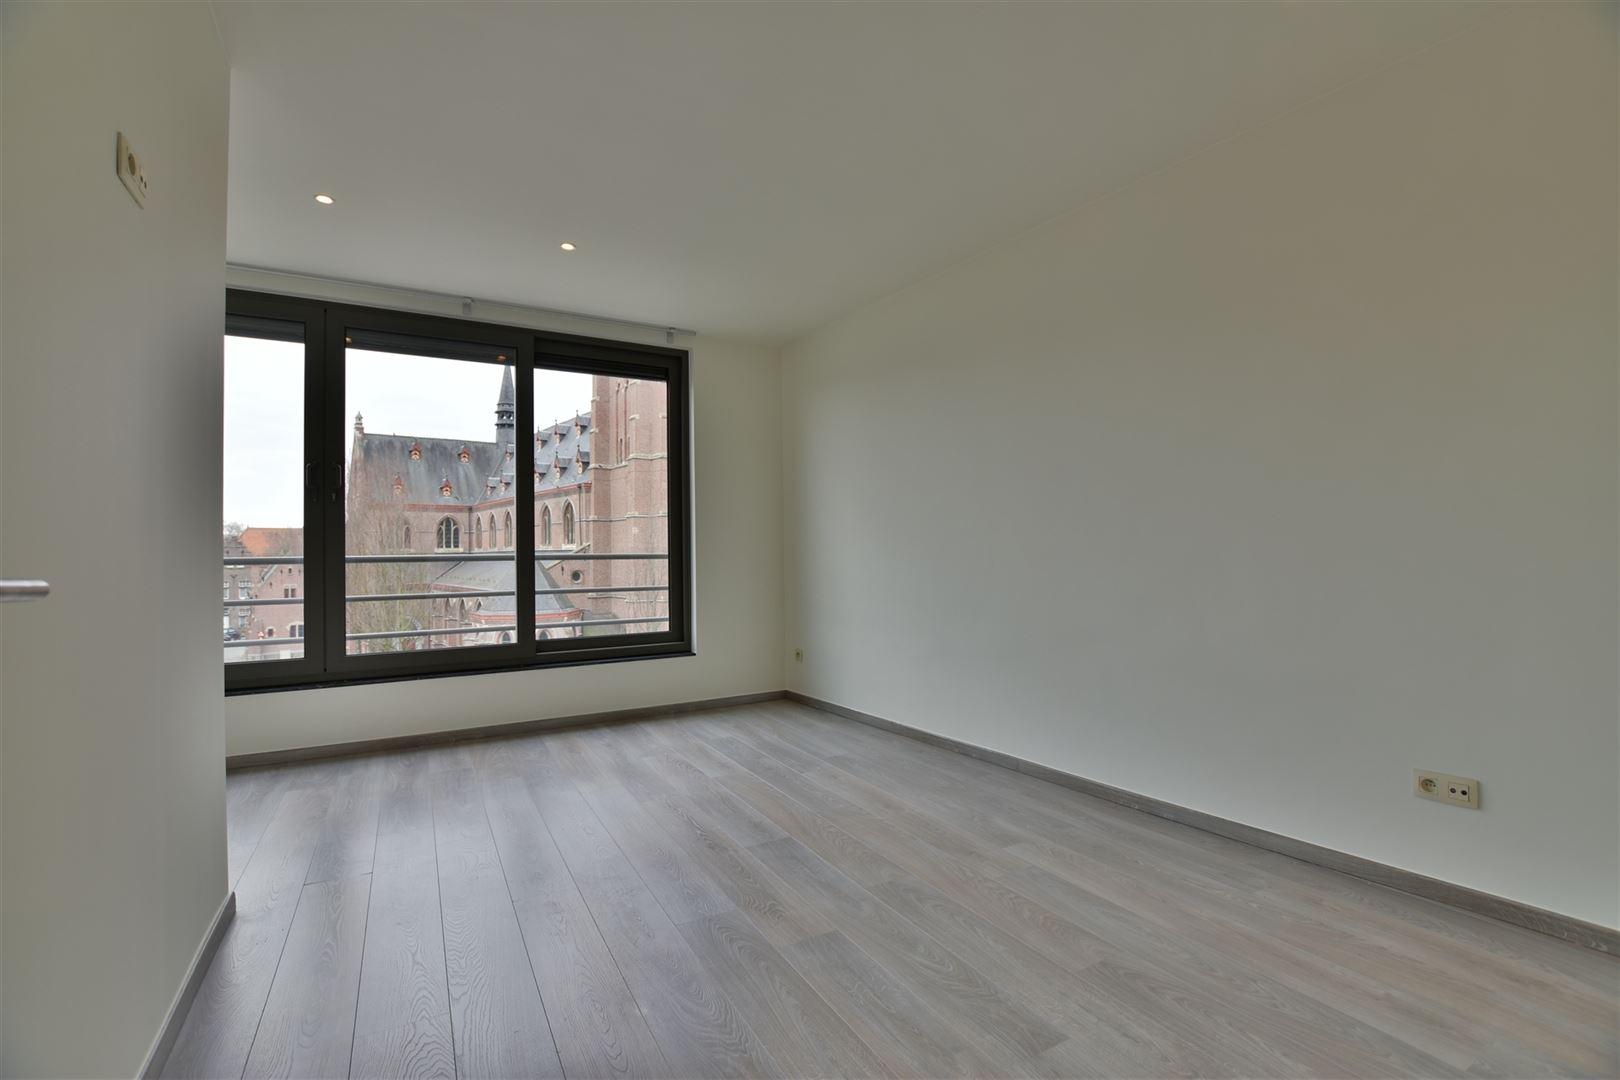 Foto 19 : Duplex/Penthouse te 9200 Sint-Gillis-bij-Dendermonde (België) - Prijs € 278.000